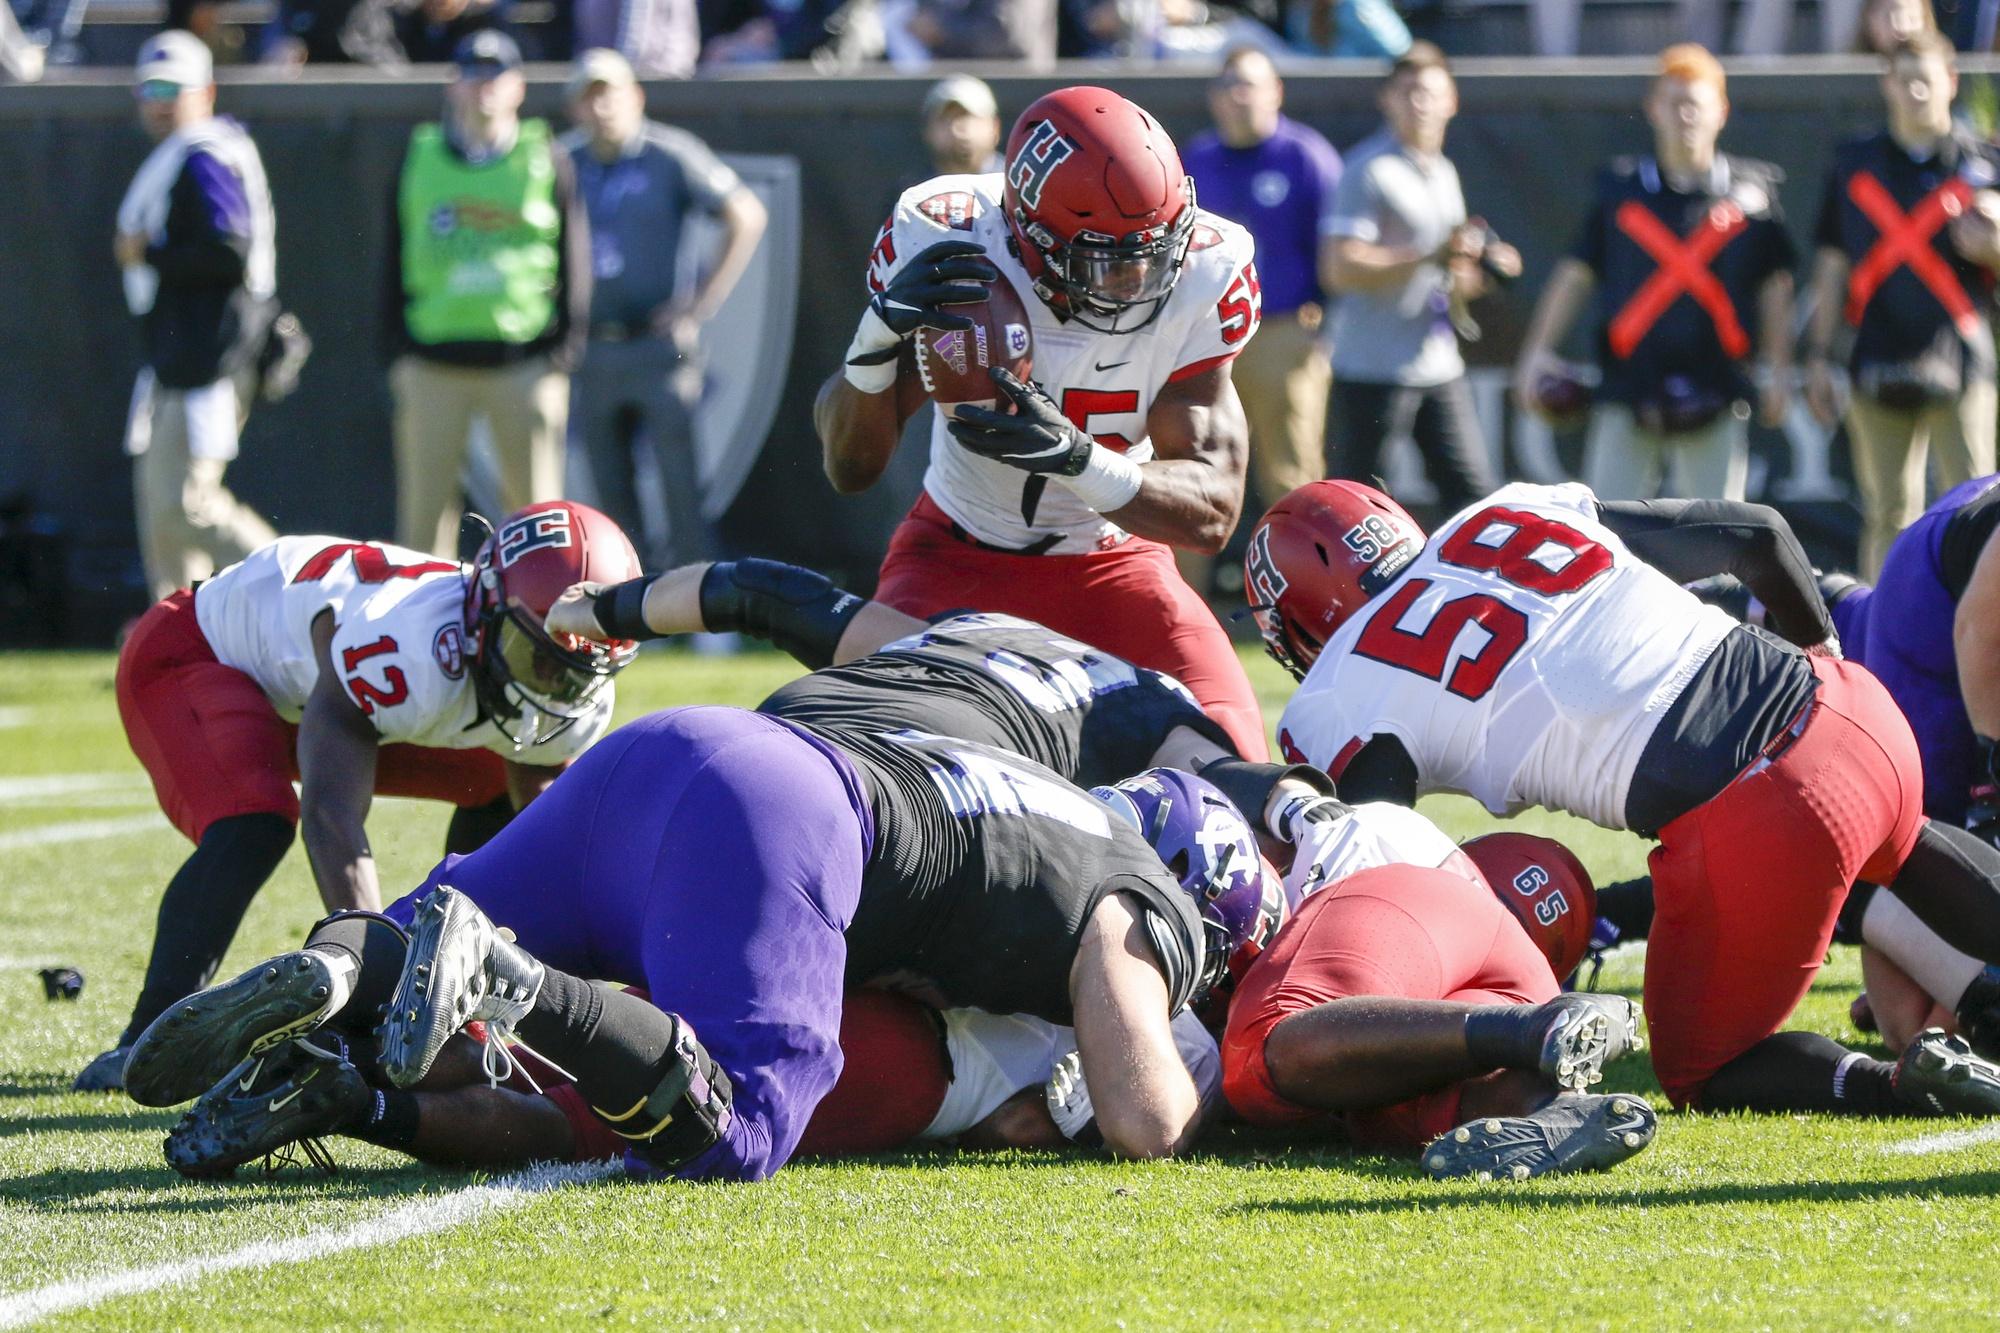 Junior linebacker Jordan Hill recovers a fumble in Saturday's contest. The junior is averaging 4.2 tackles per game.